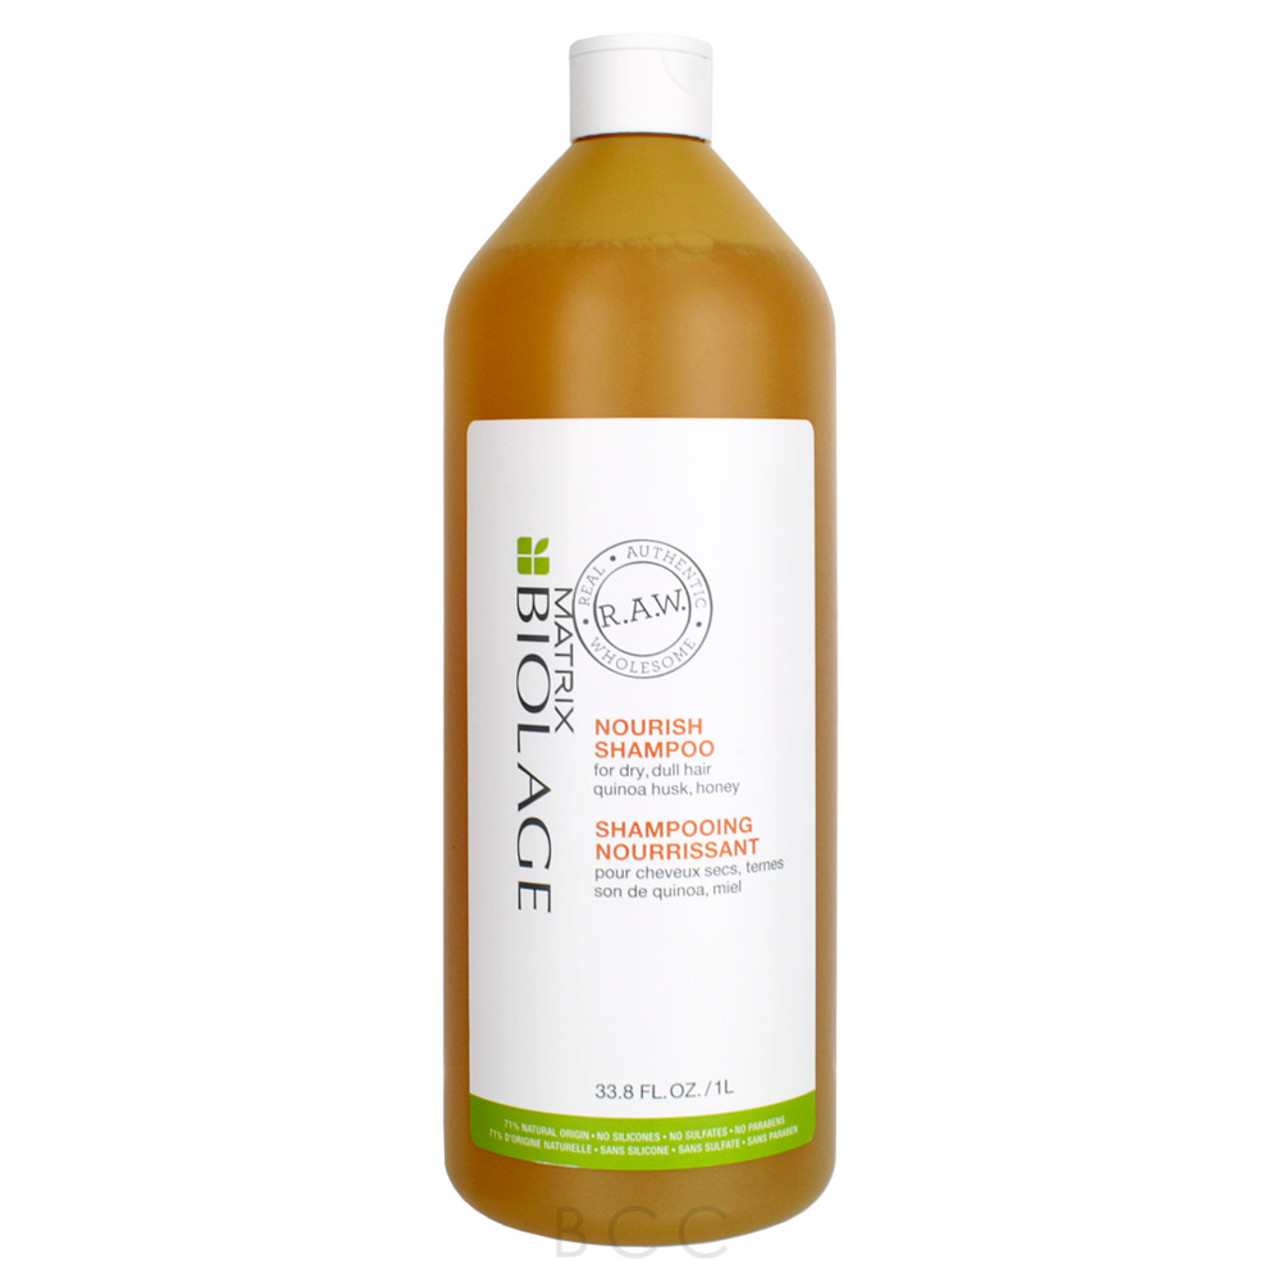 Biolage RAW Nourish Shampoo